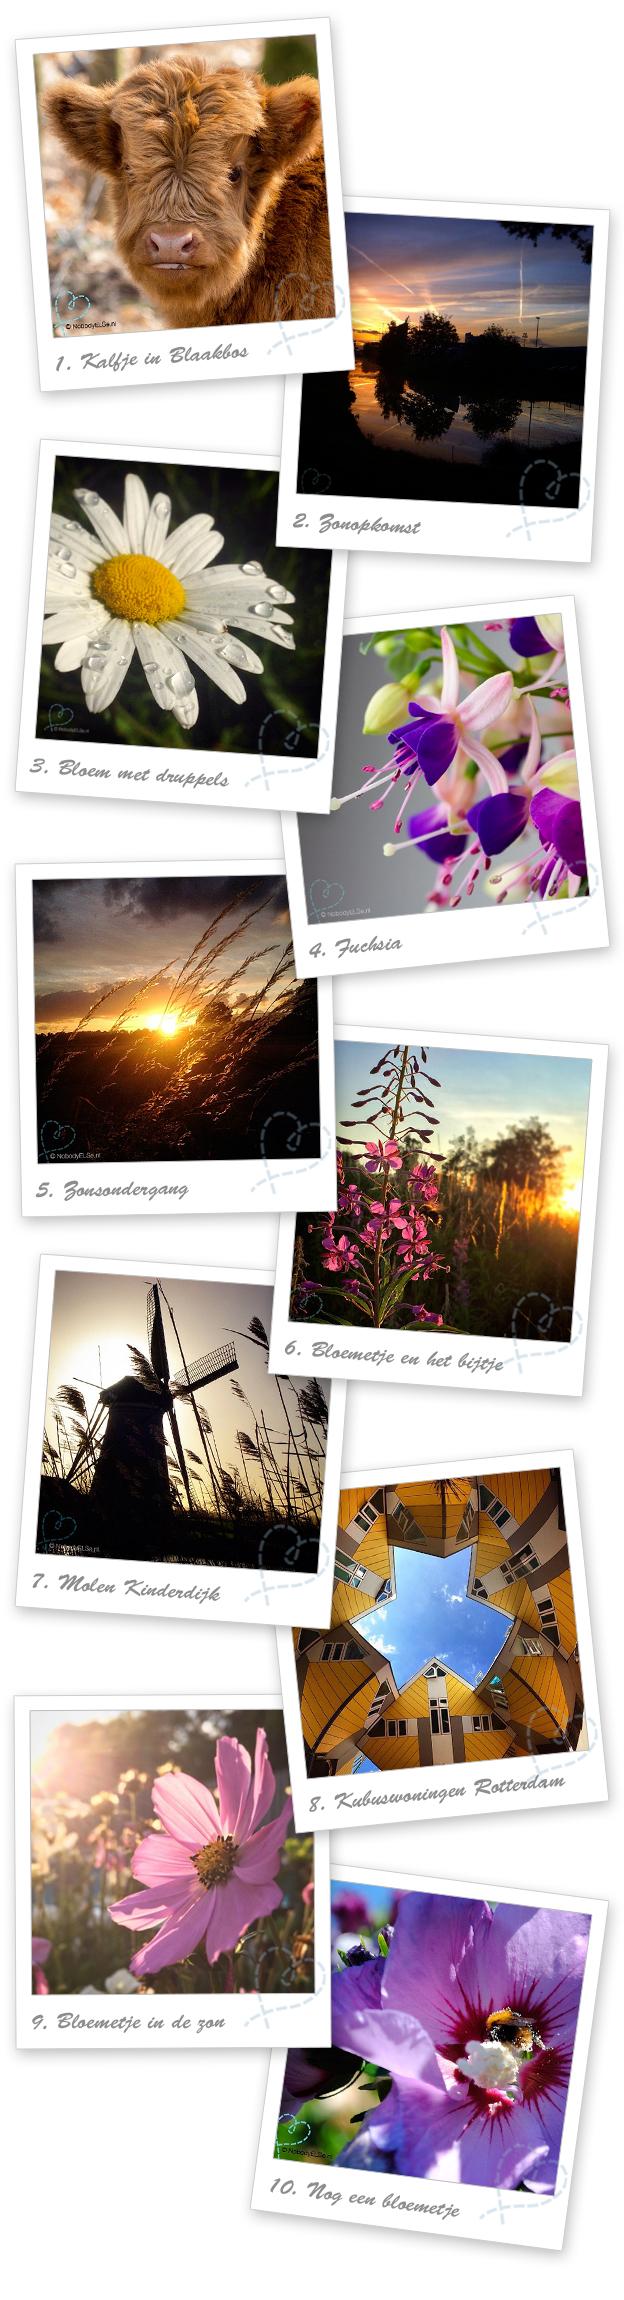 overzicht instagram